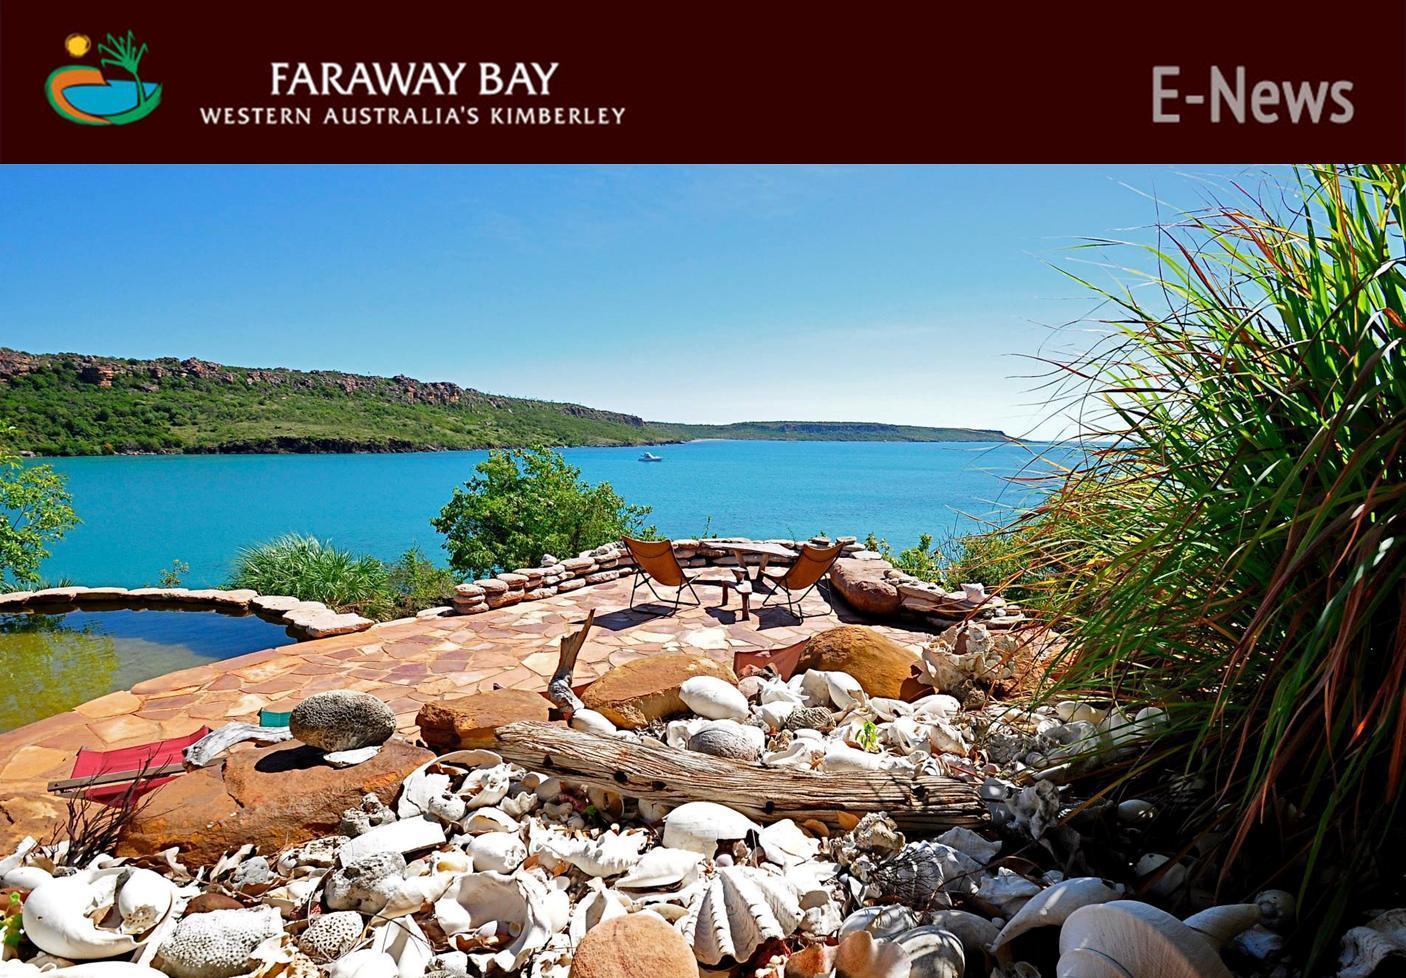 Faraway Bay Summer E-News